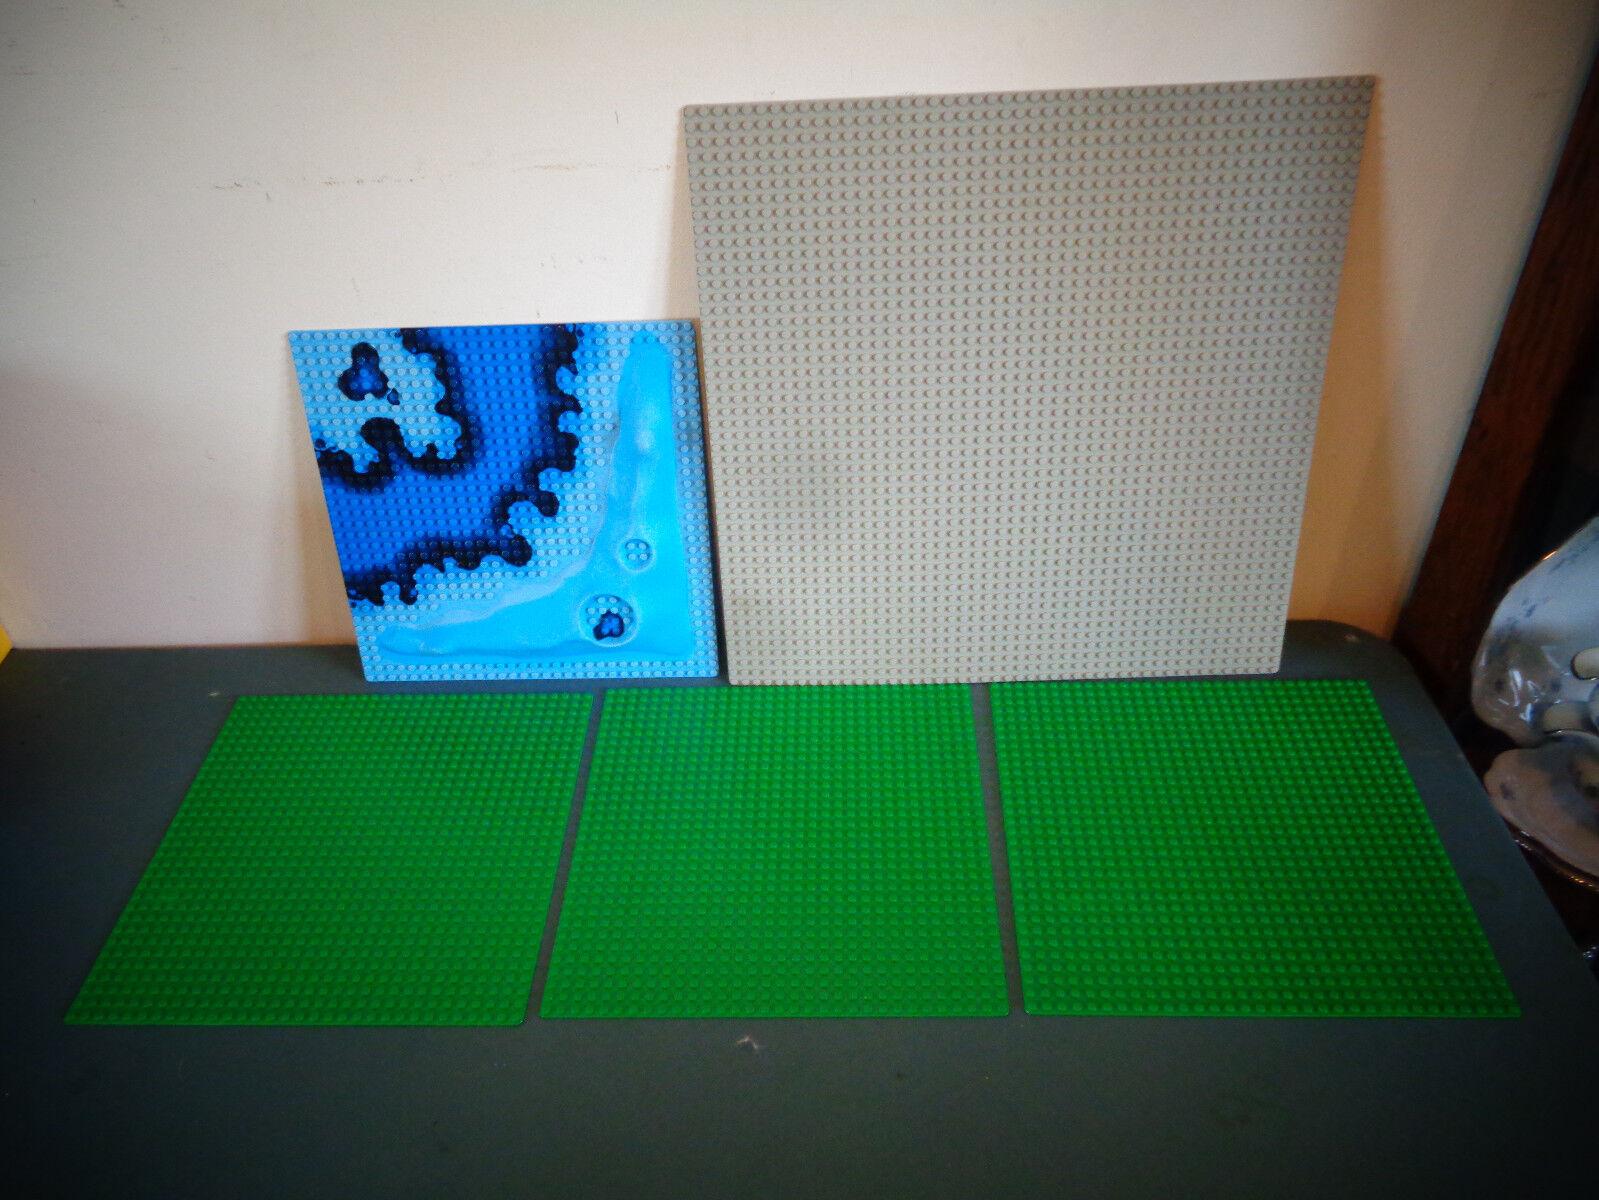 Lego placas base 1 gris 48 Dot 15 X 15 - 3 verde 32 Dot 10 X 10 - 1 Azul planteó